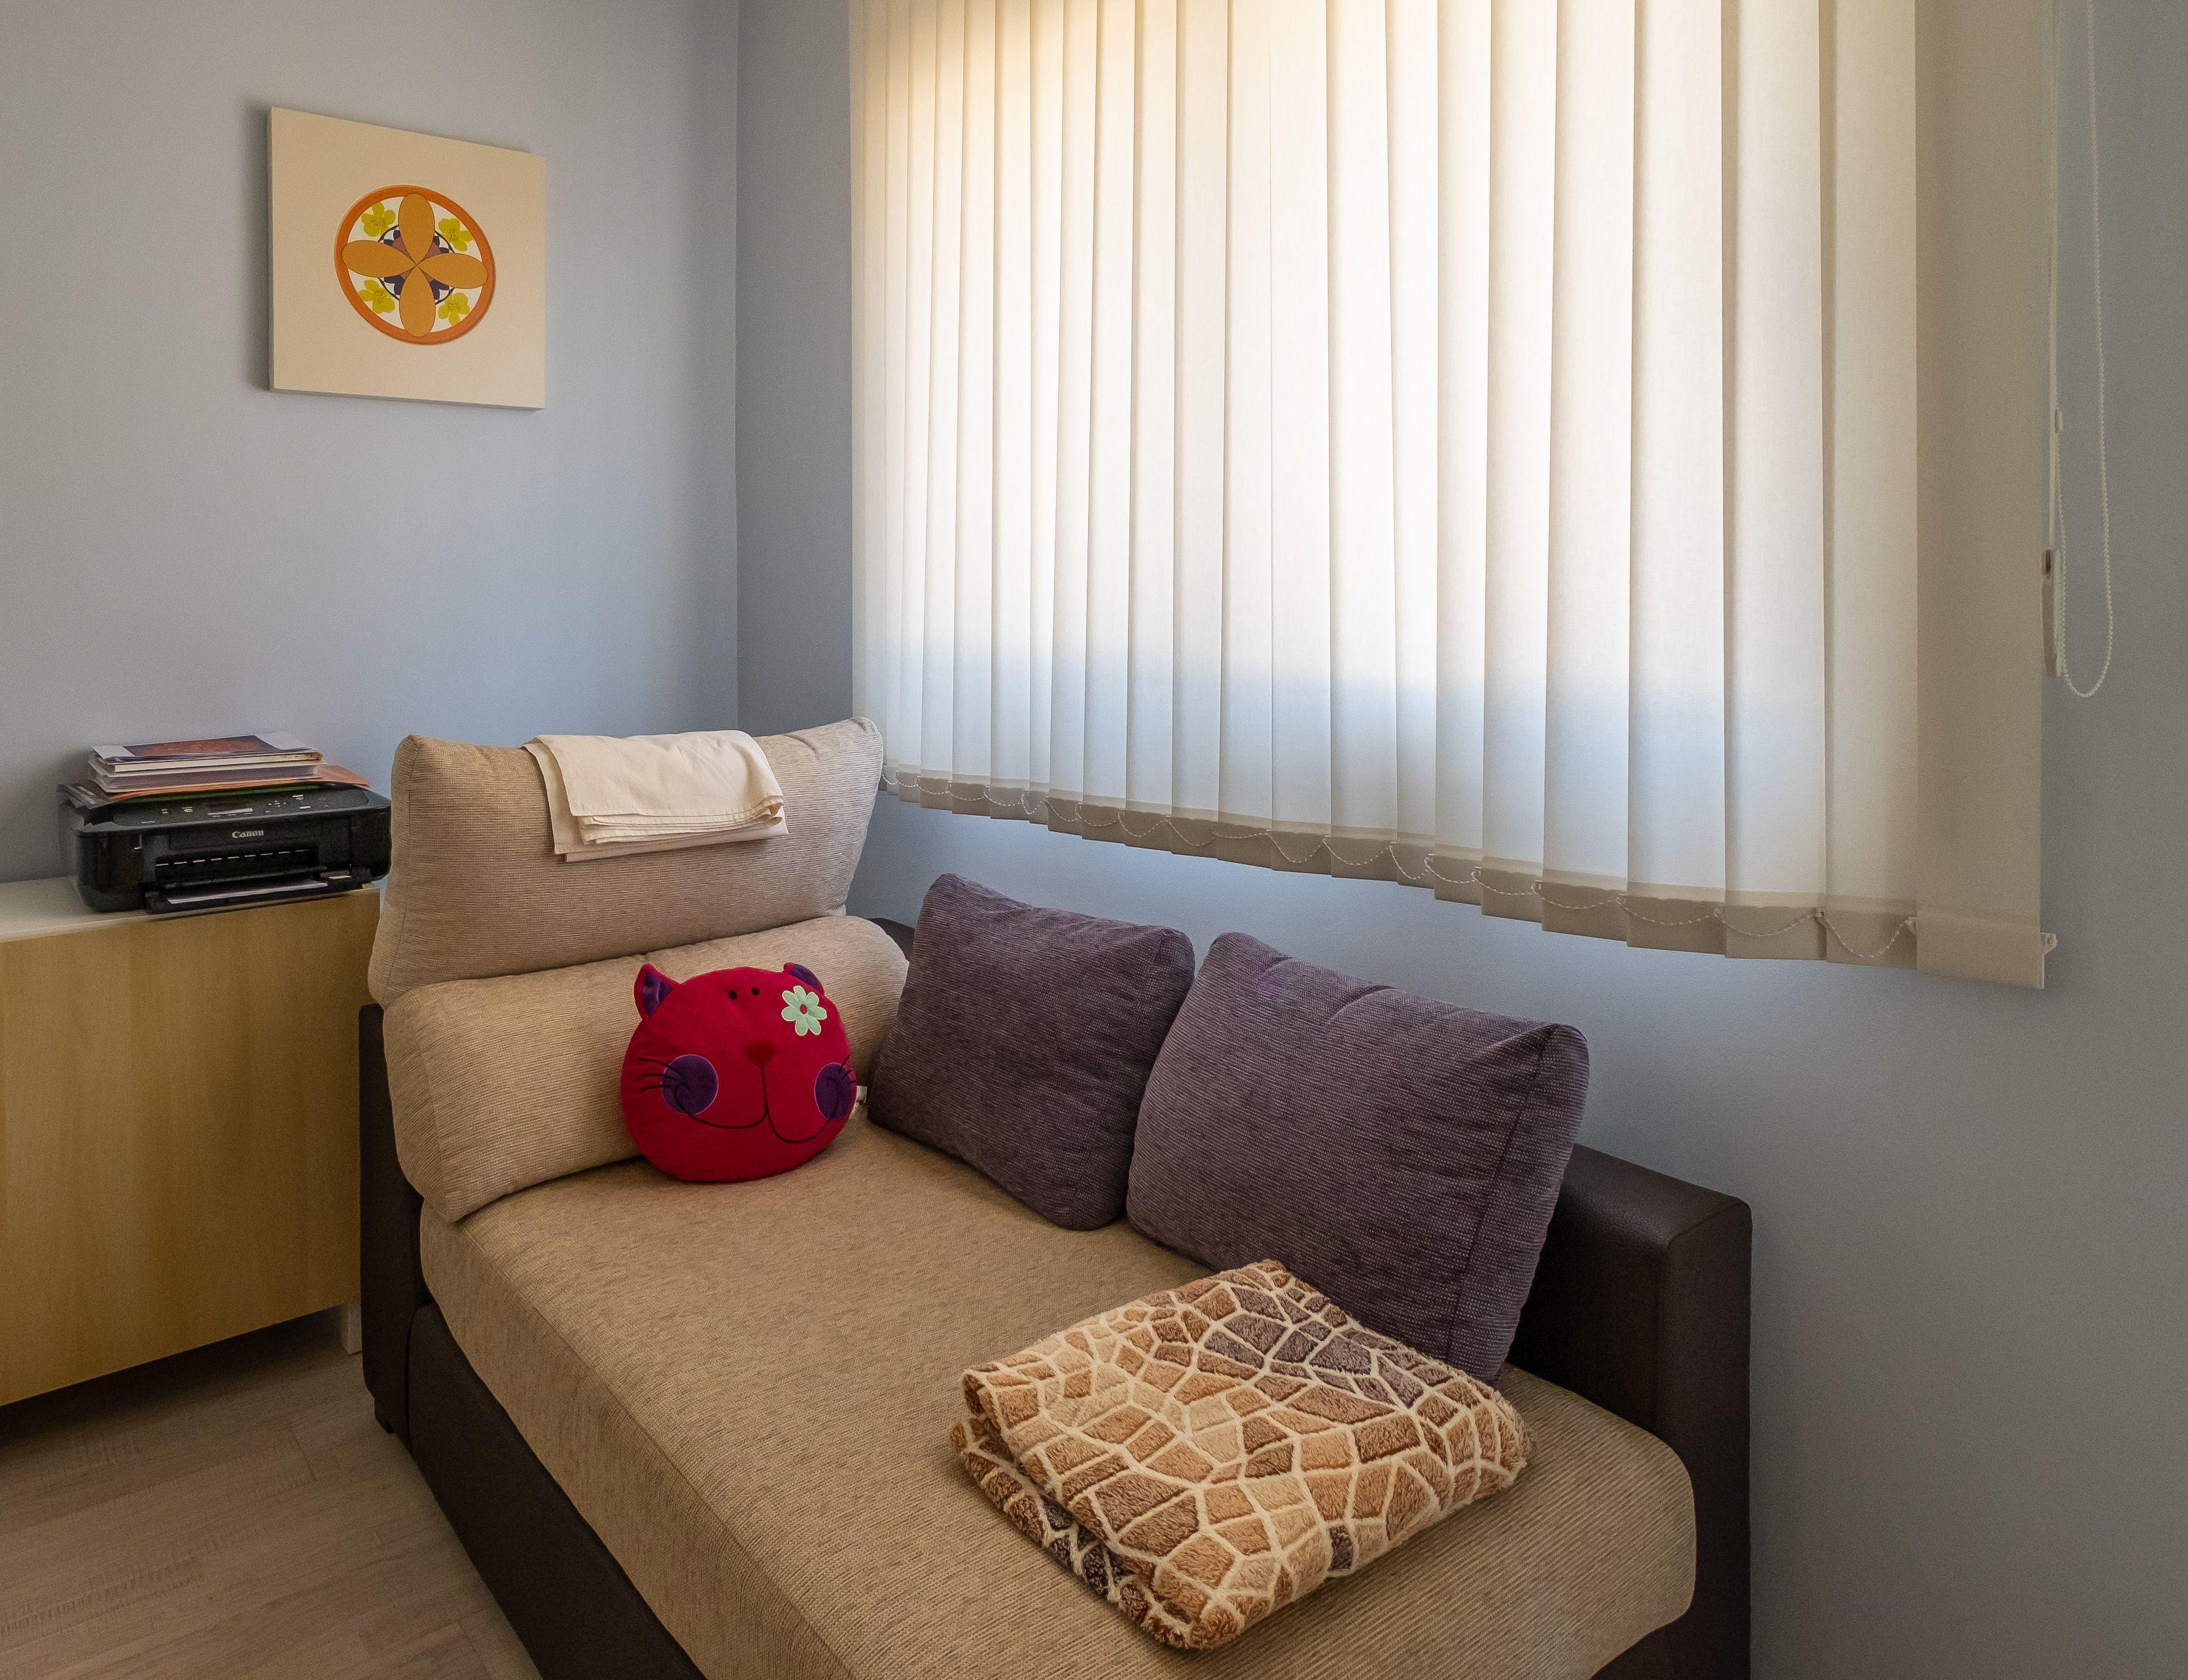 Consulta terapéutica Marclar Terapies en Barberá del Vallés